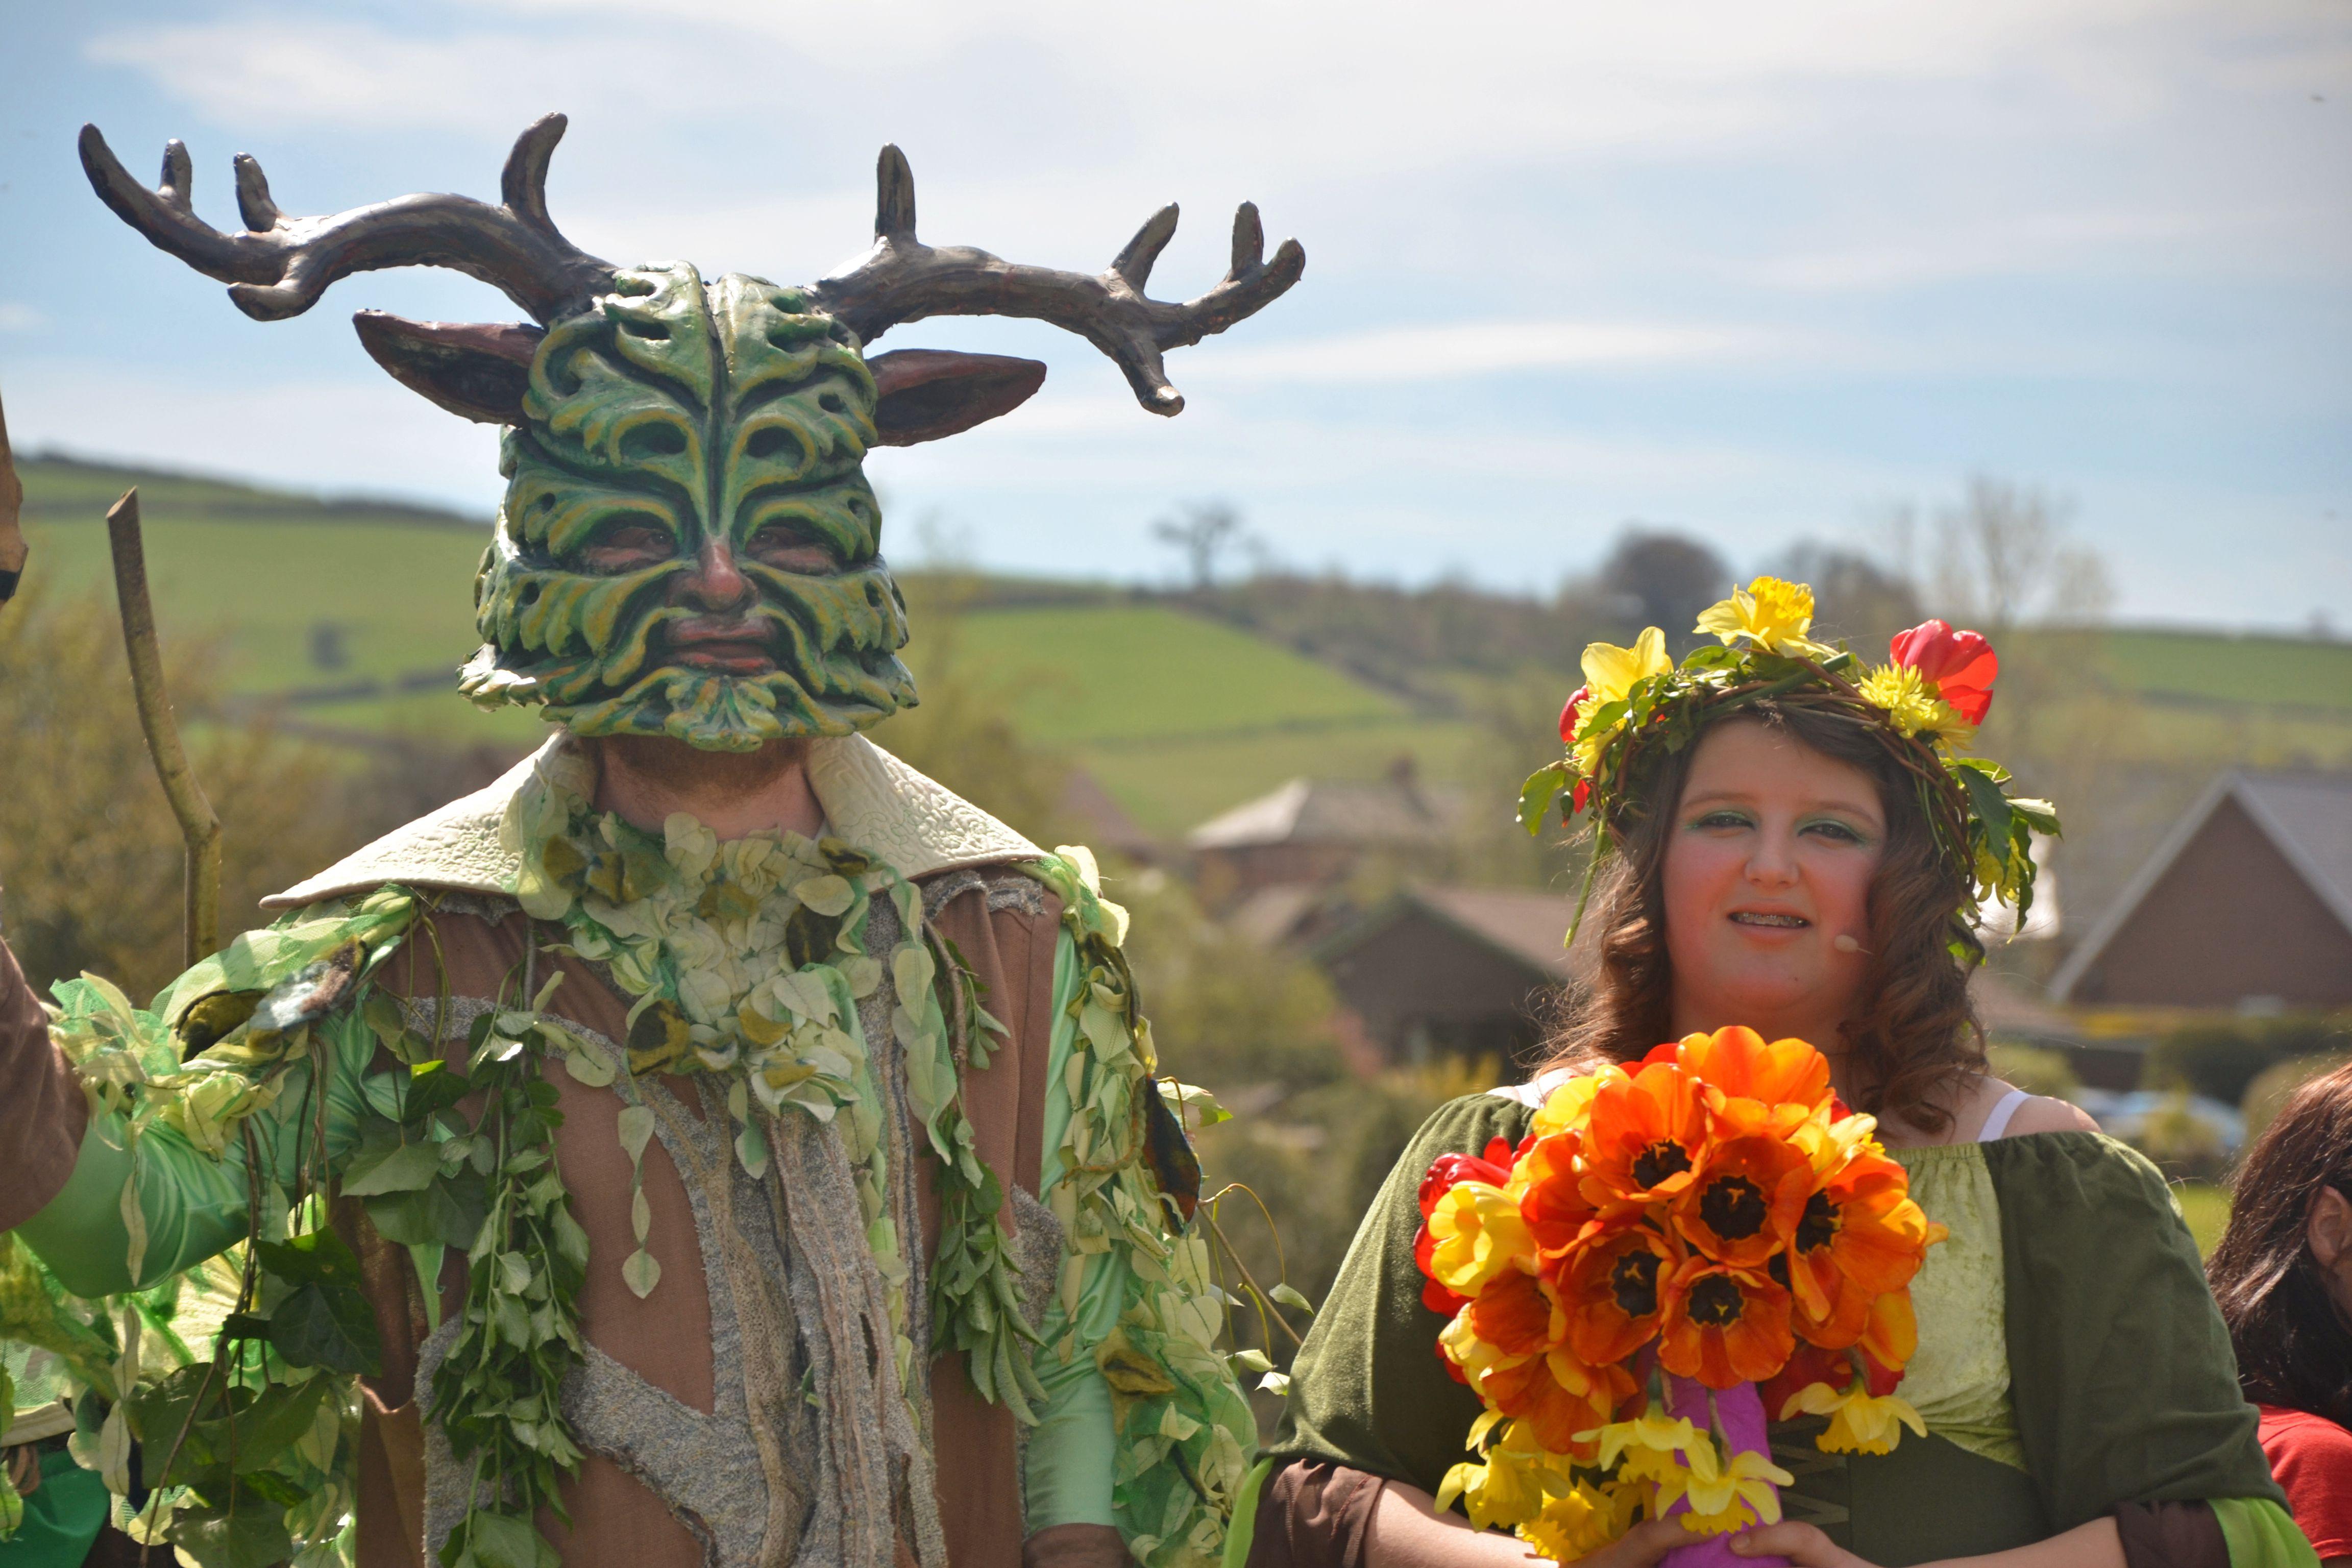 Green Man & May Queen